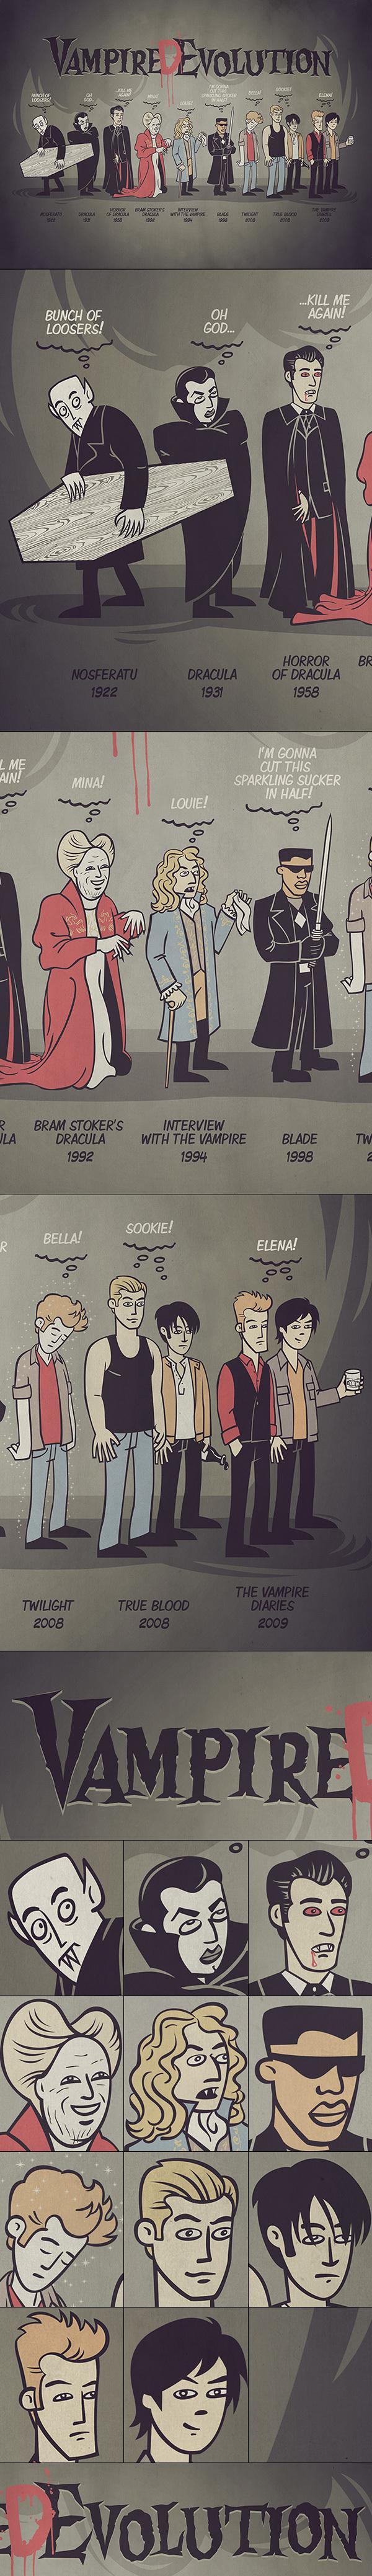 Vampire Evolution on